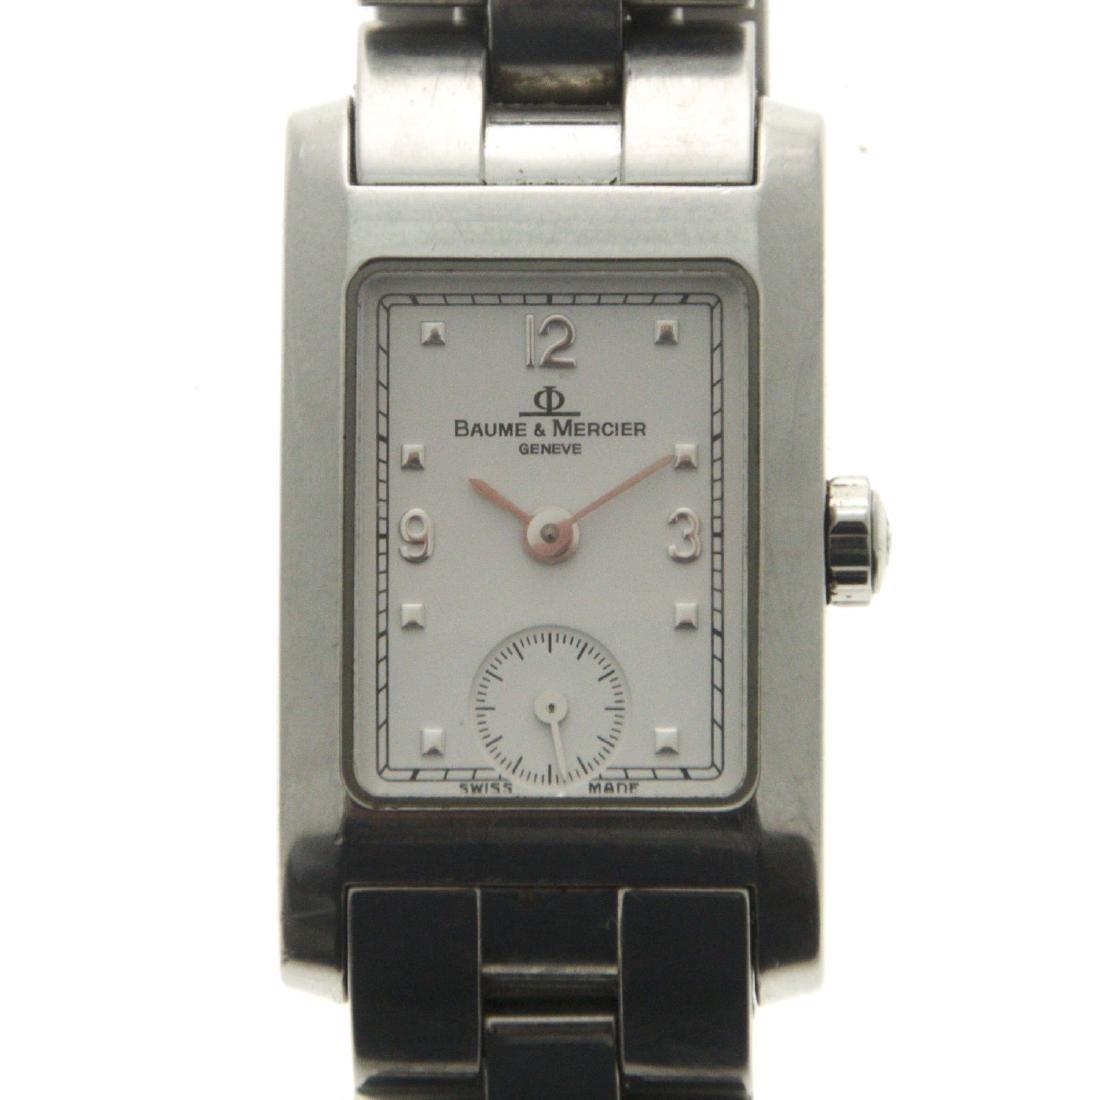 Baume & Mercier Lady's Wrist Watch.